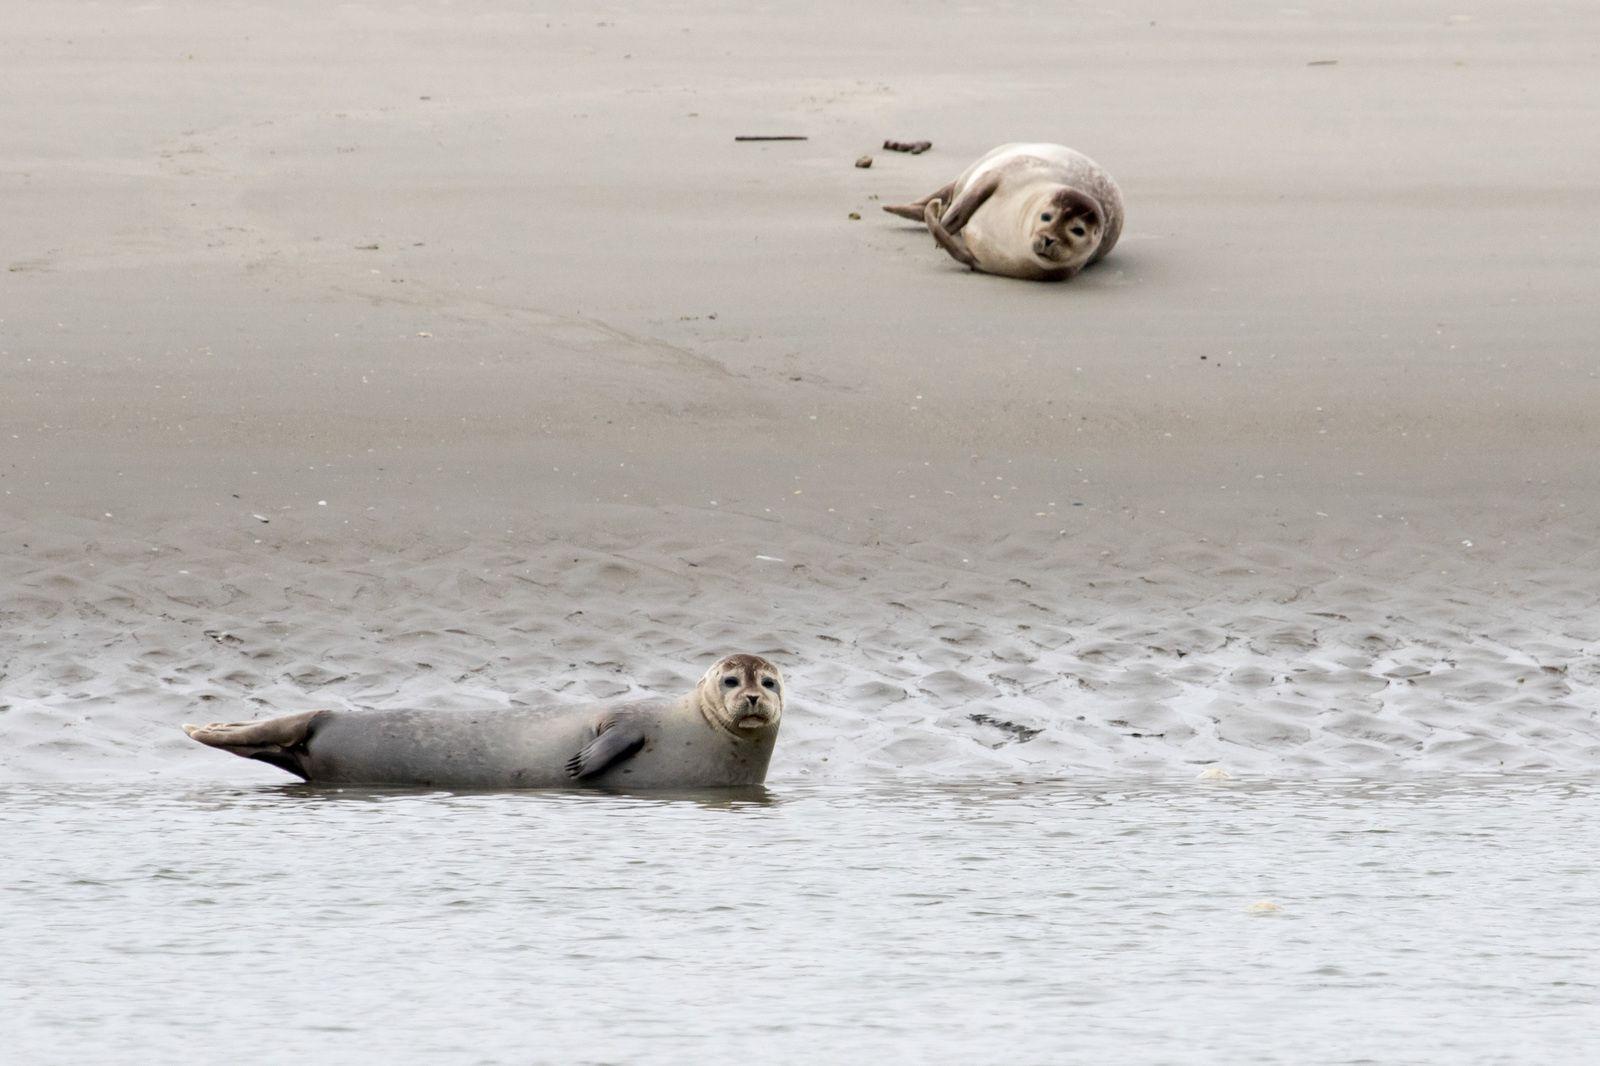 Week-end en baie de Somme - Les phoques !